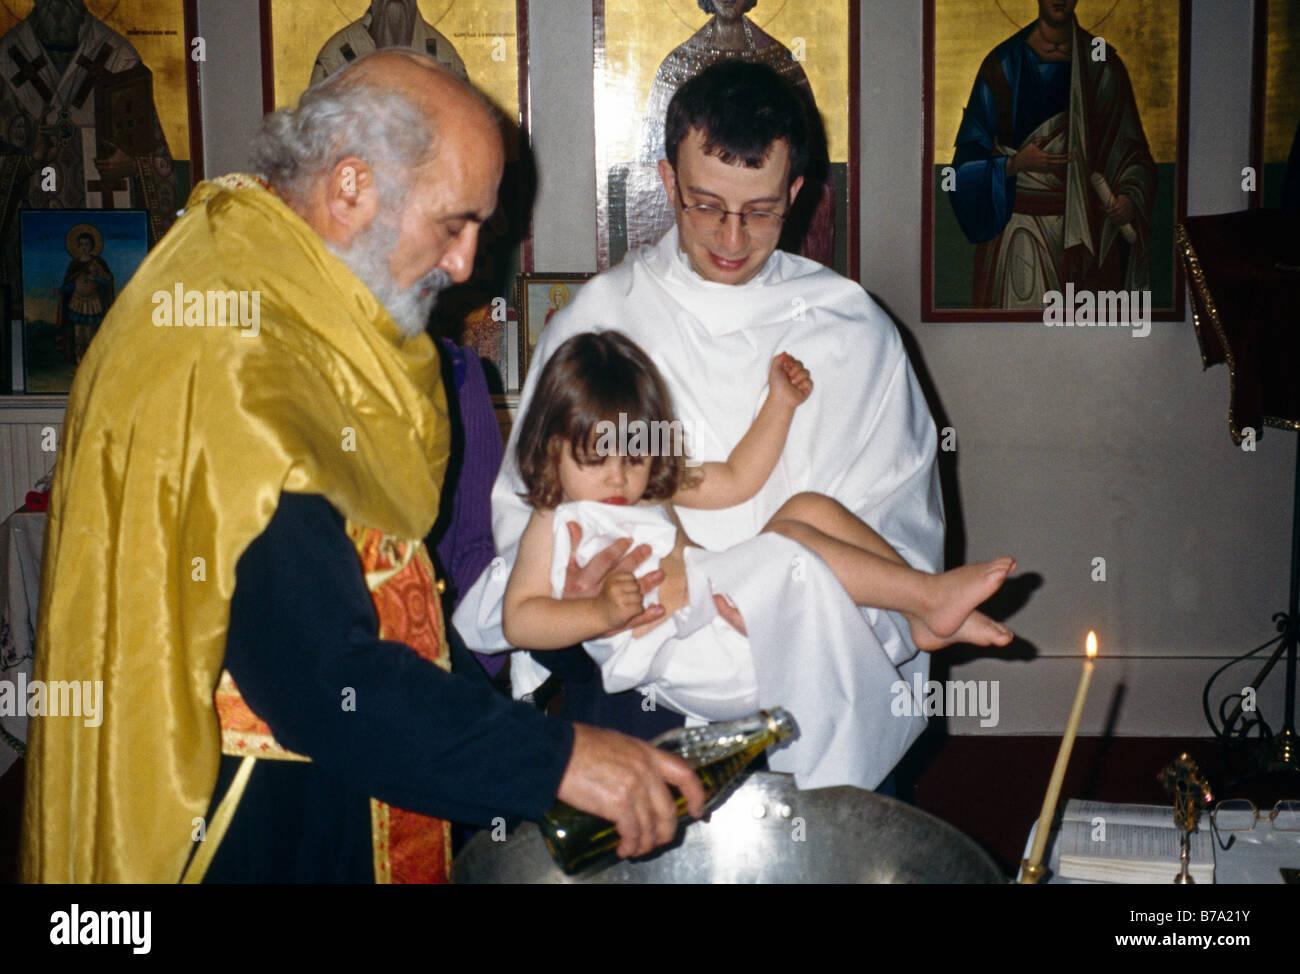 Baptism Oil Stock Photos & Baptism Oil Stock Images - Alamy